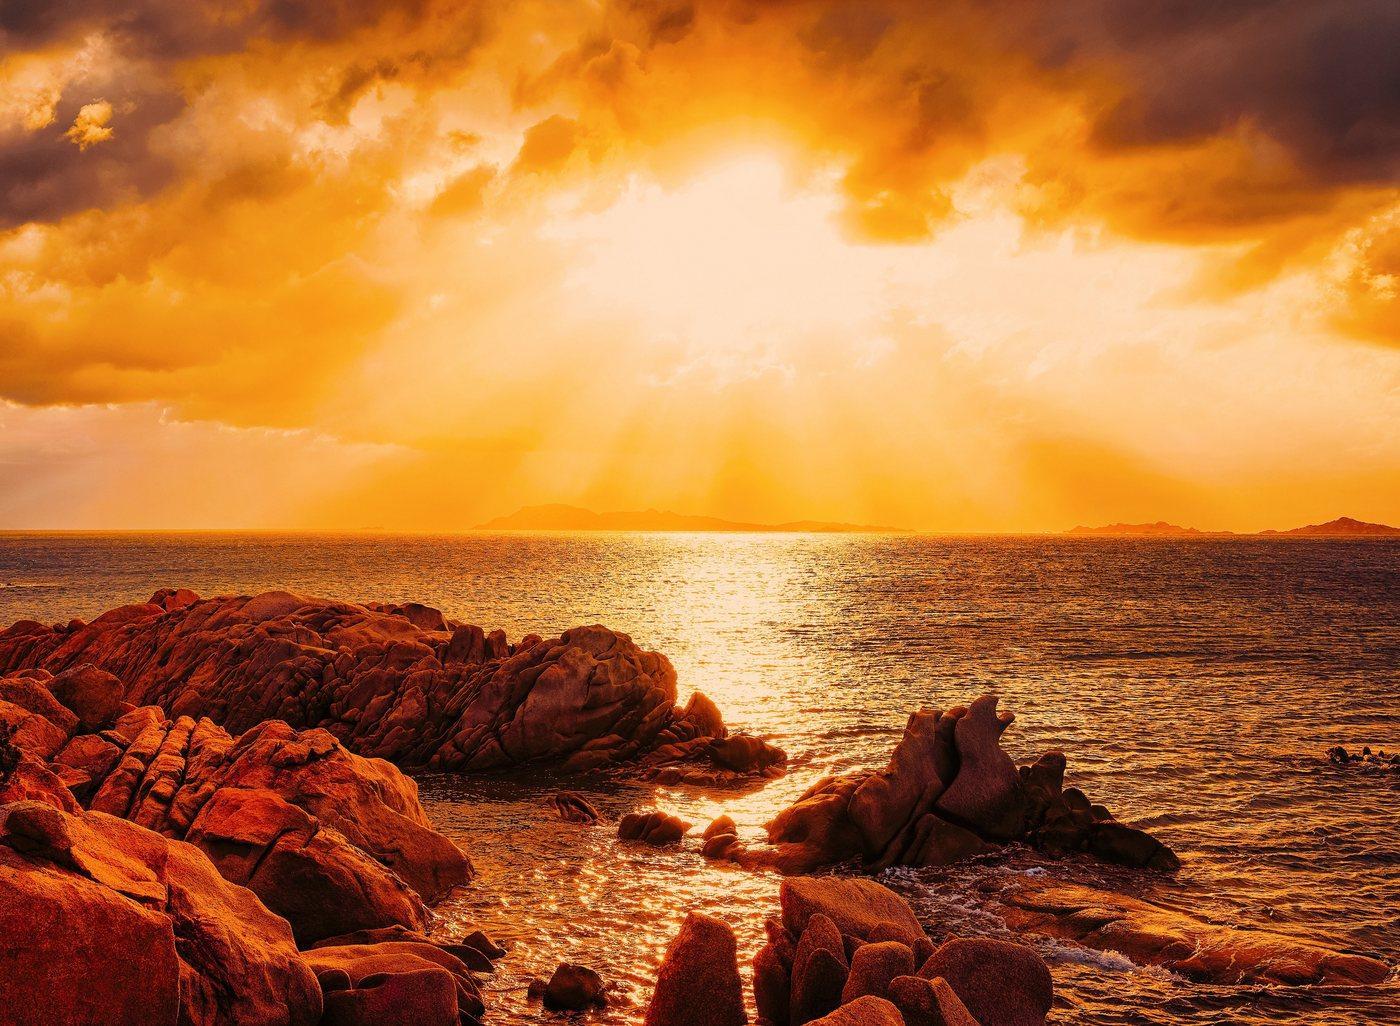 Papermoon Fototapete »Capriccioli Beach Sunset Sardinia«, glatt